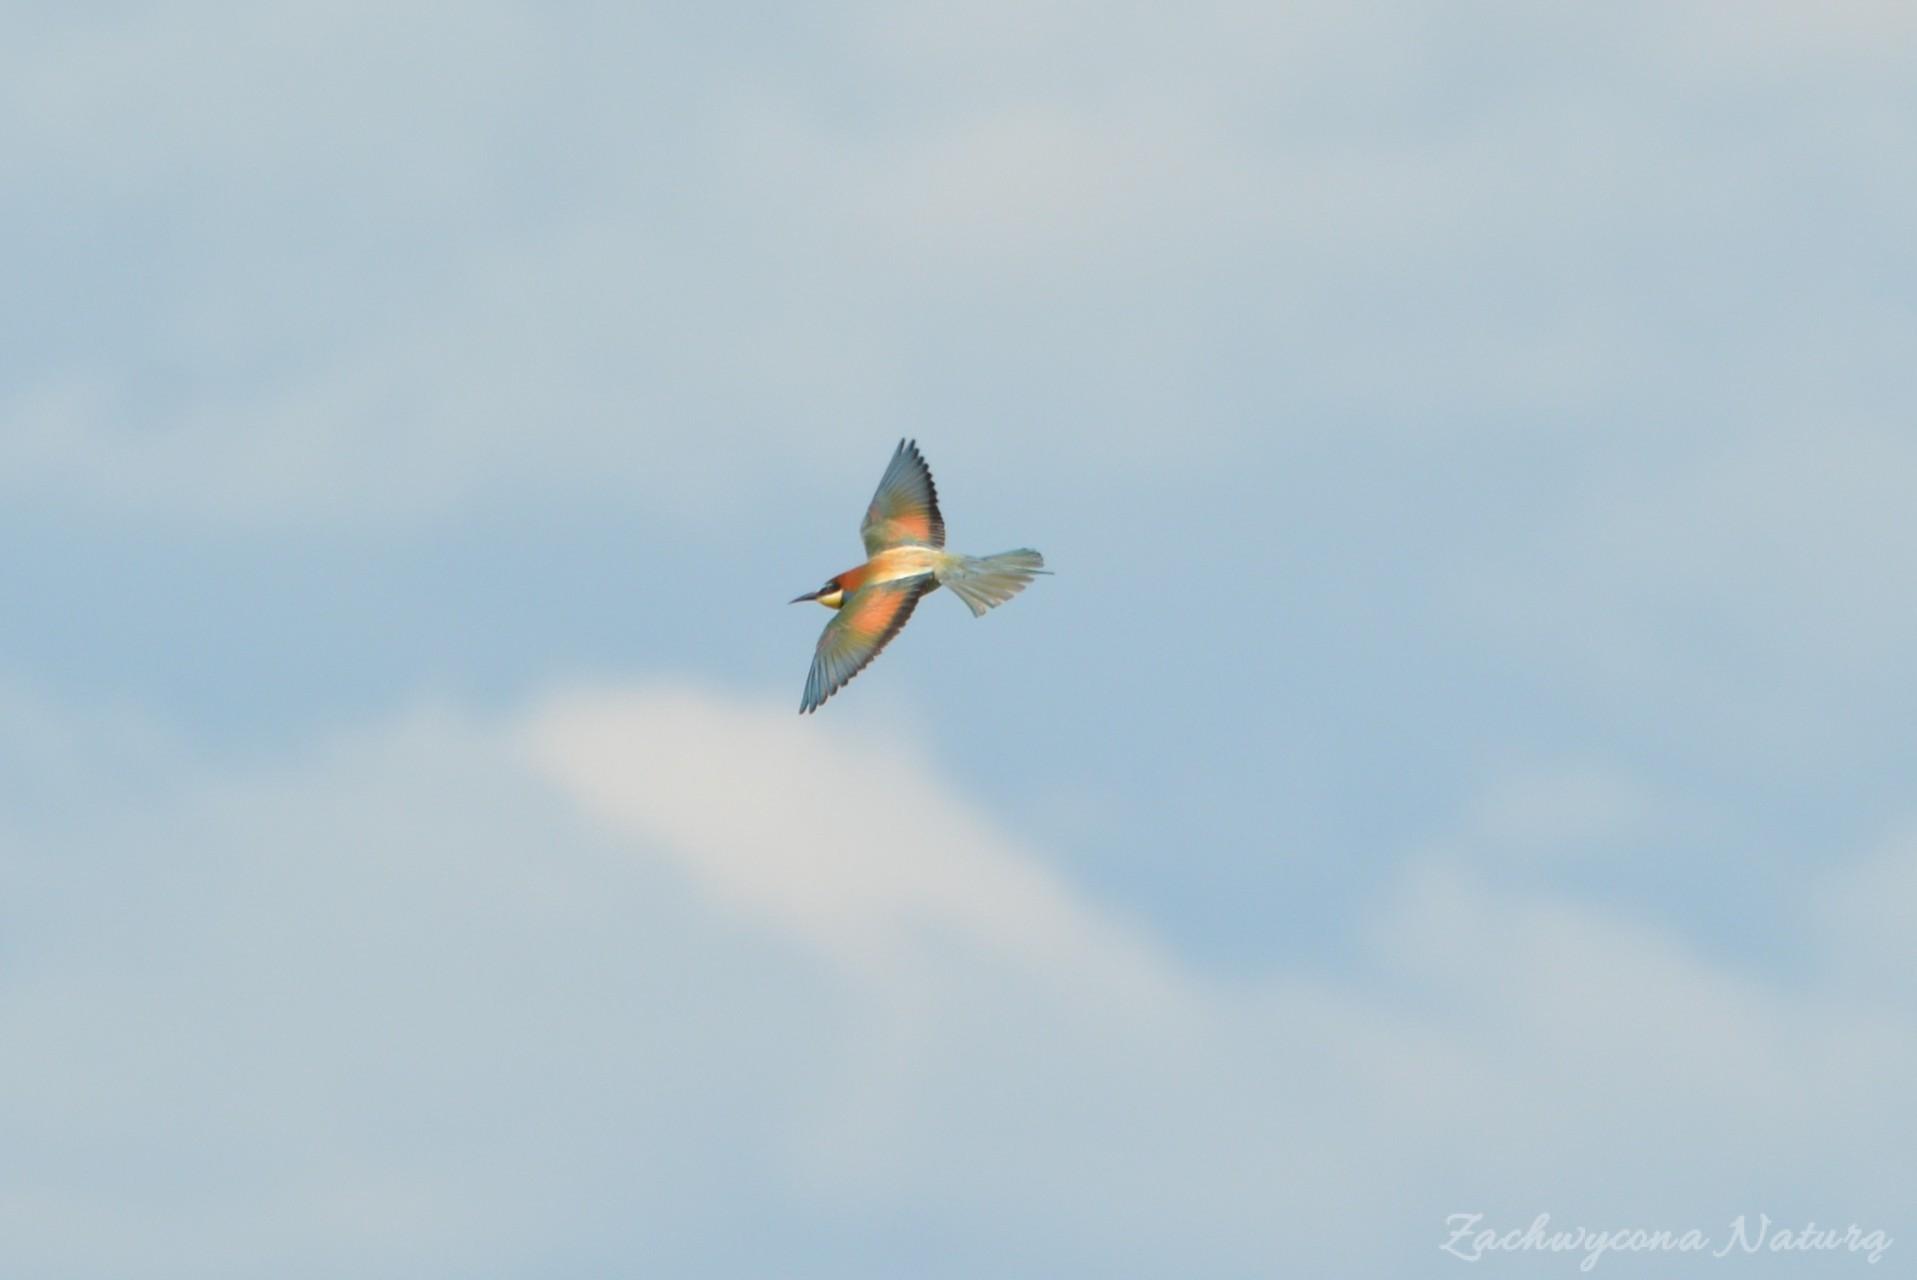 zolna-kolorowa-jak-papuga-merops-apiaster-bee-eater-10